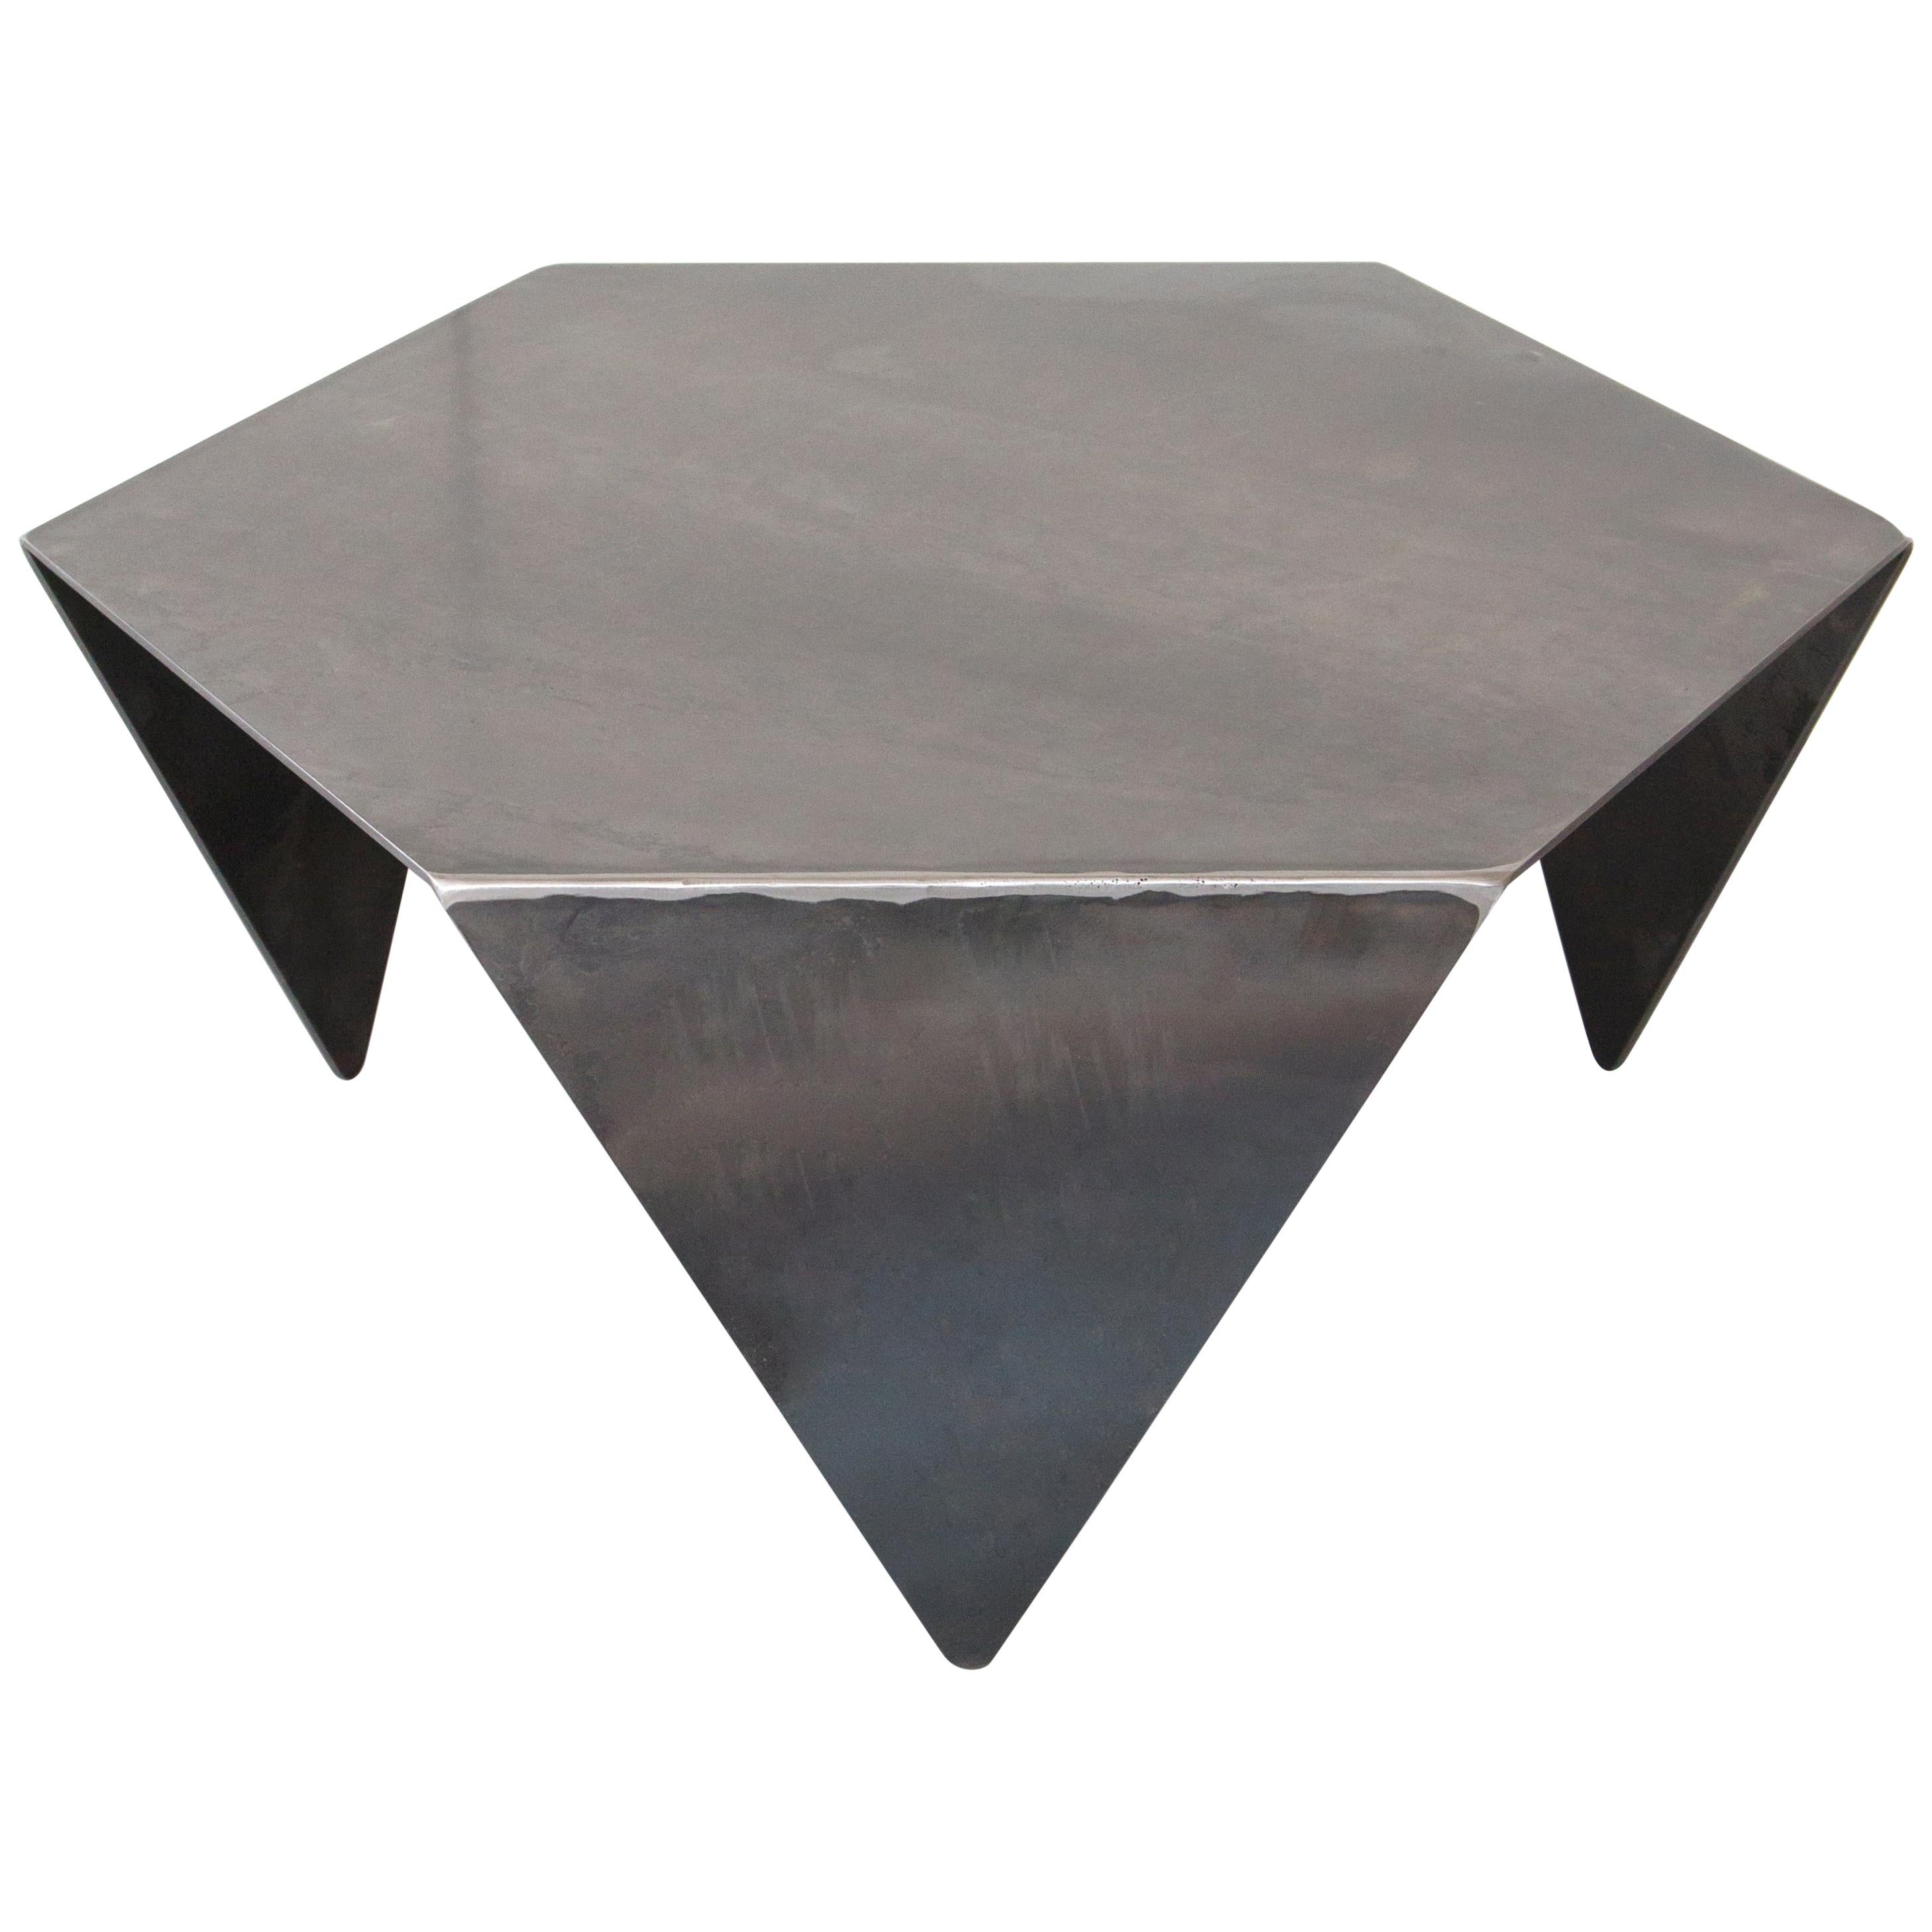 Hexagon Coffee Table in Raw Black Steel Minimalist Design by Mtharu